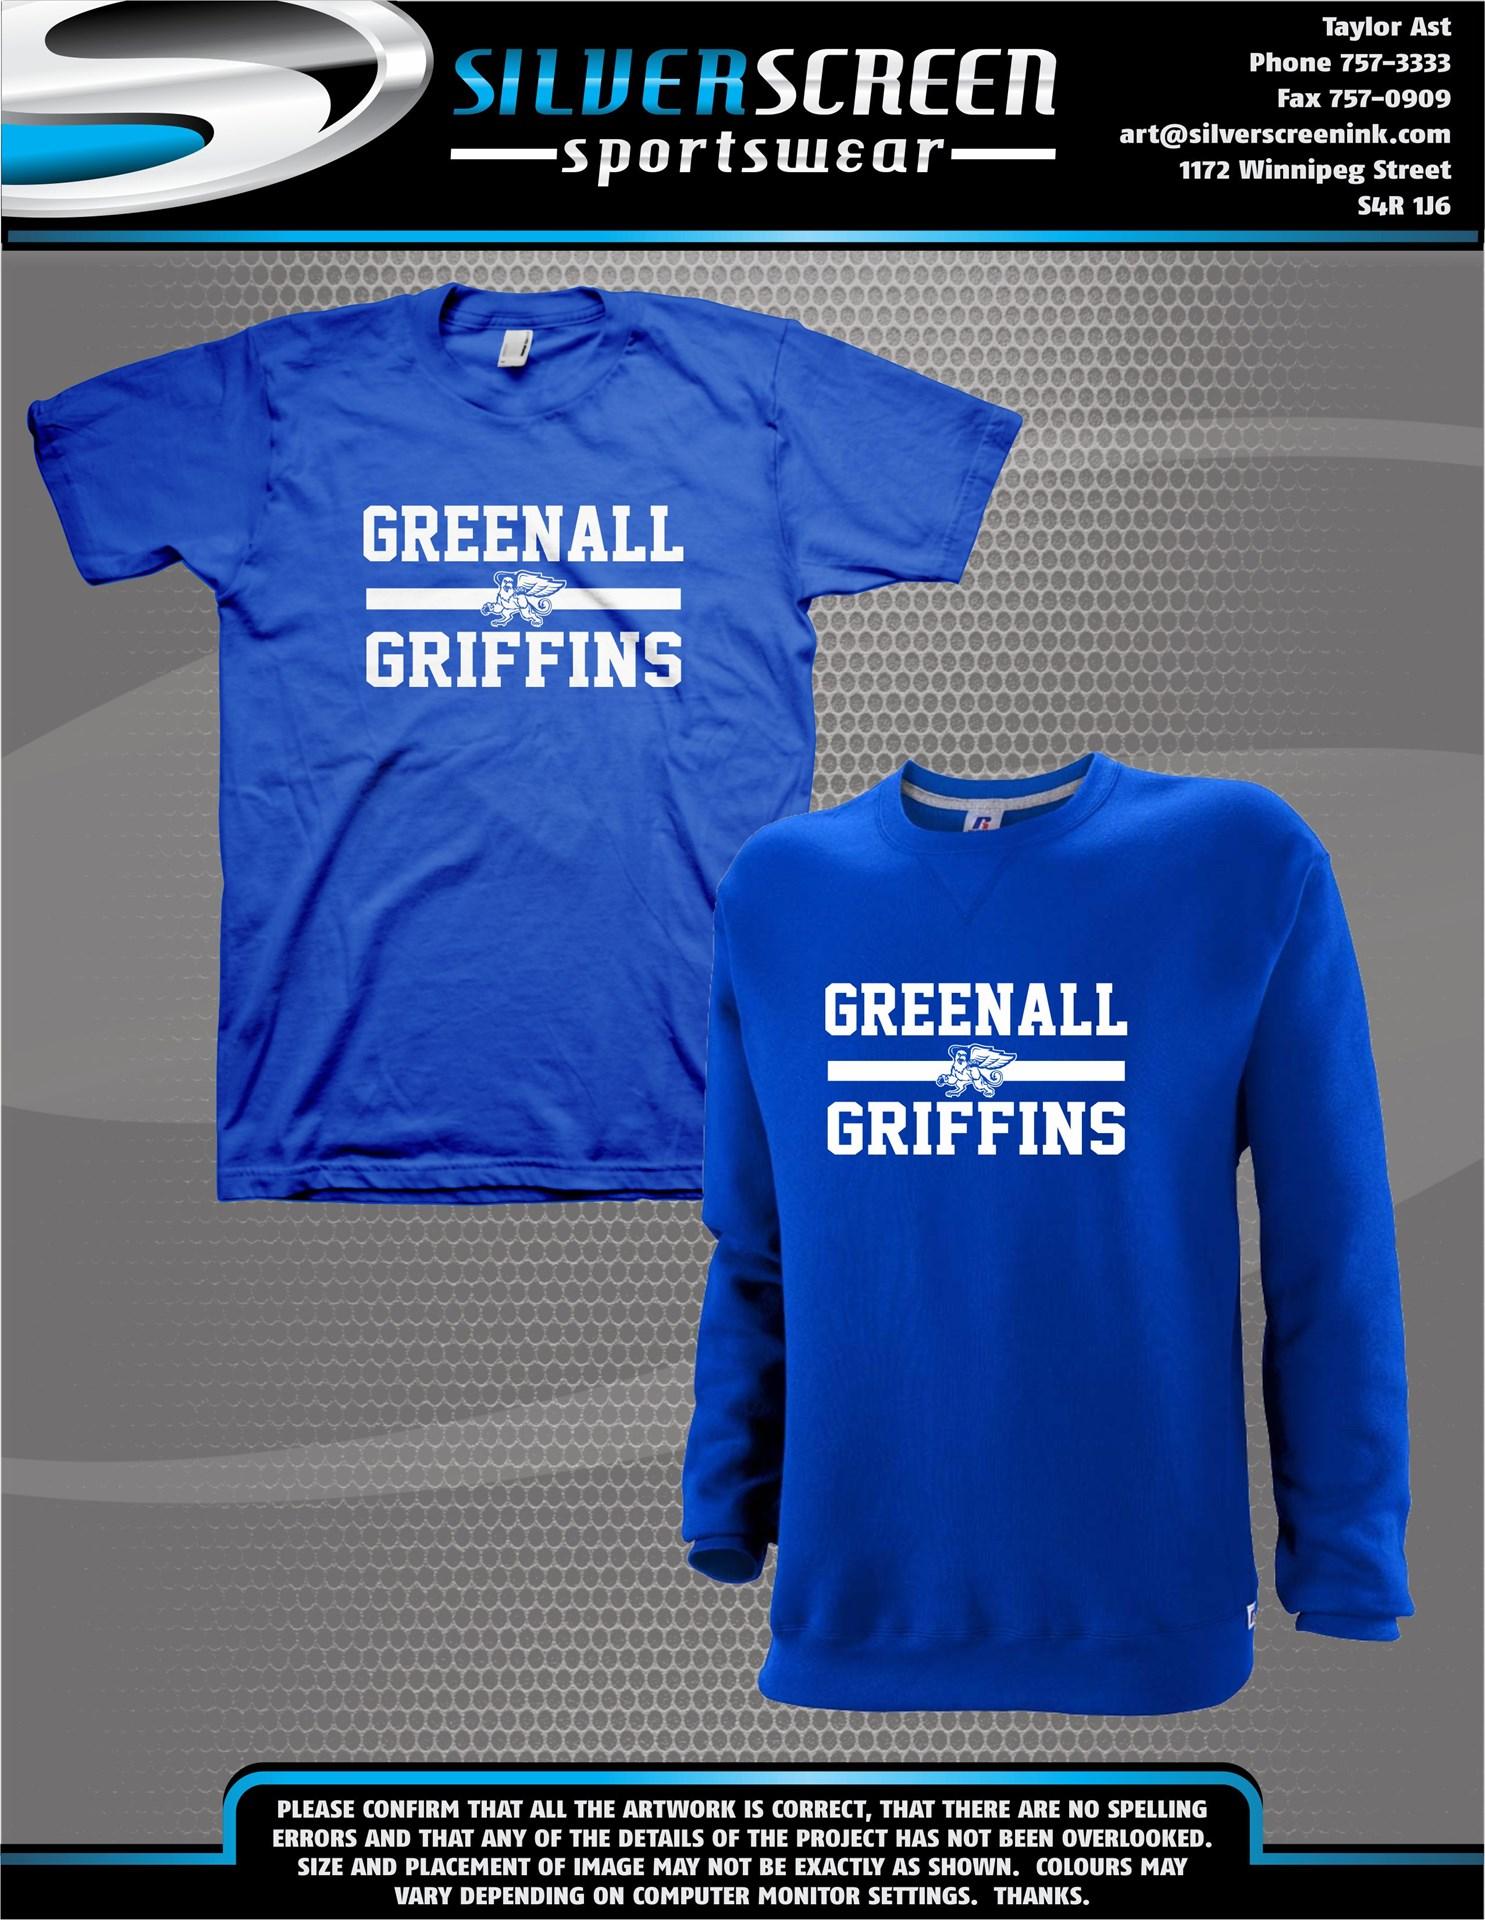 Greenall Griffins.jpg